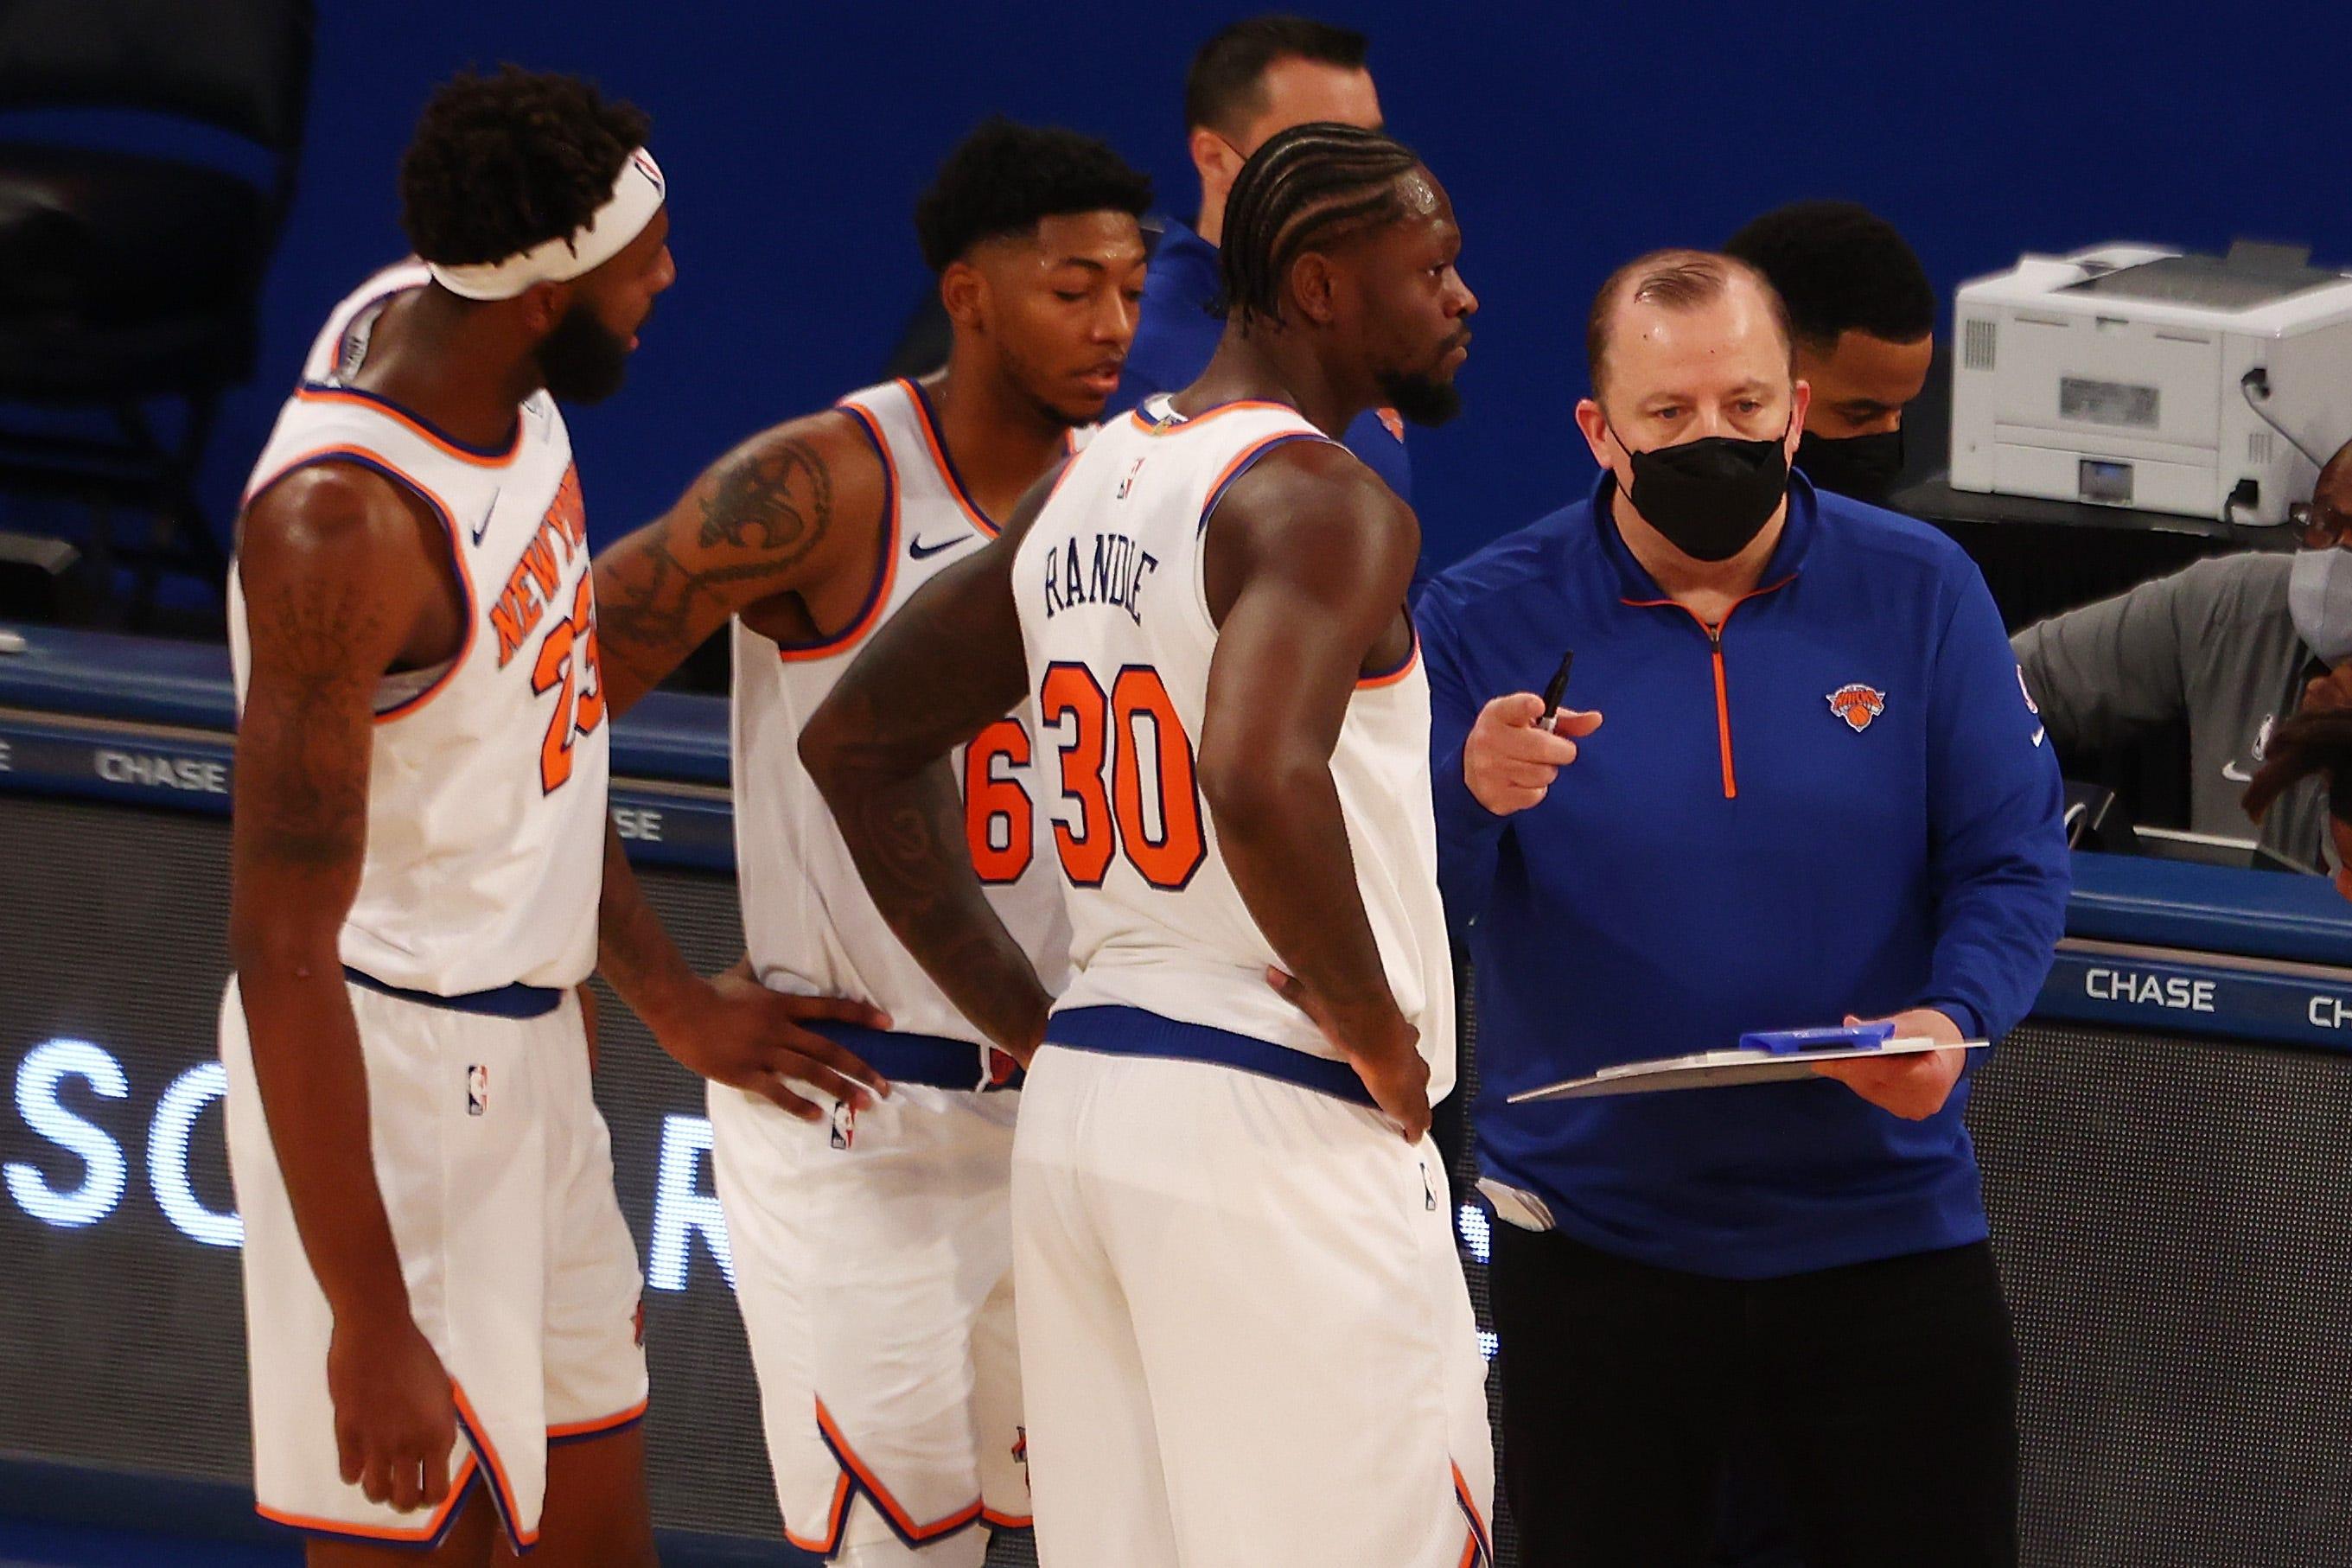 New York Knicks' Tom Thibodeau named NBA Coach of the Year